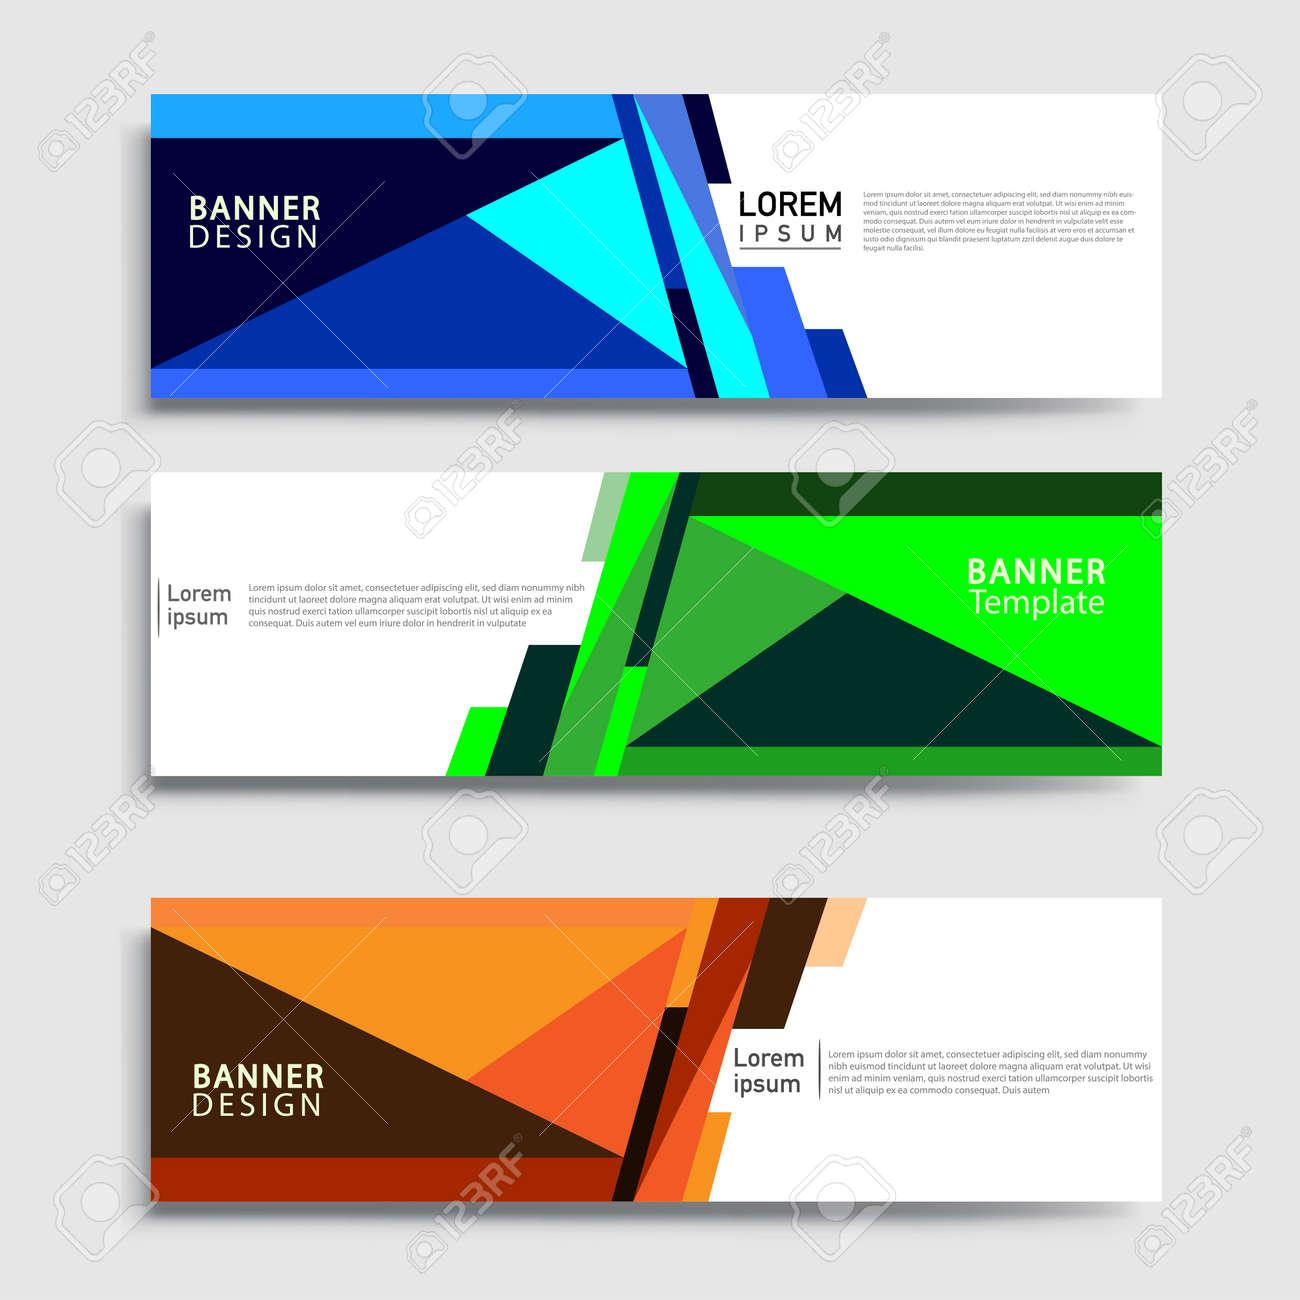 Vector abstract web banner design template sets. Collection of web banner template. Abstract geometric web design banner template. - 157545774